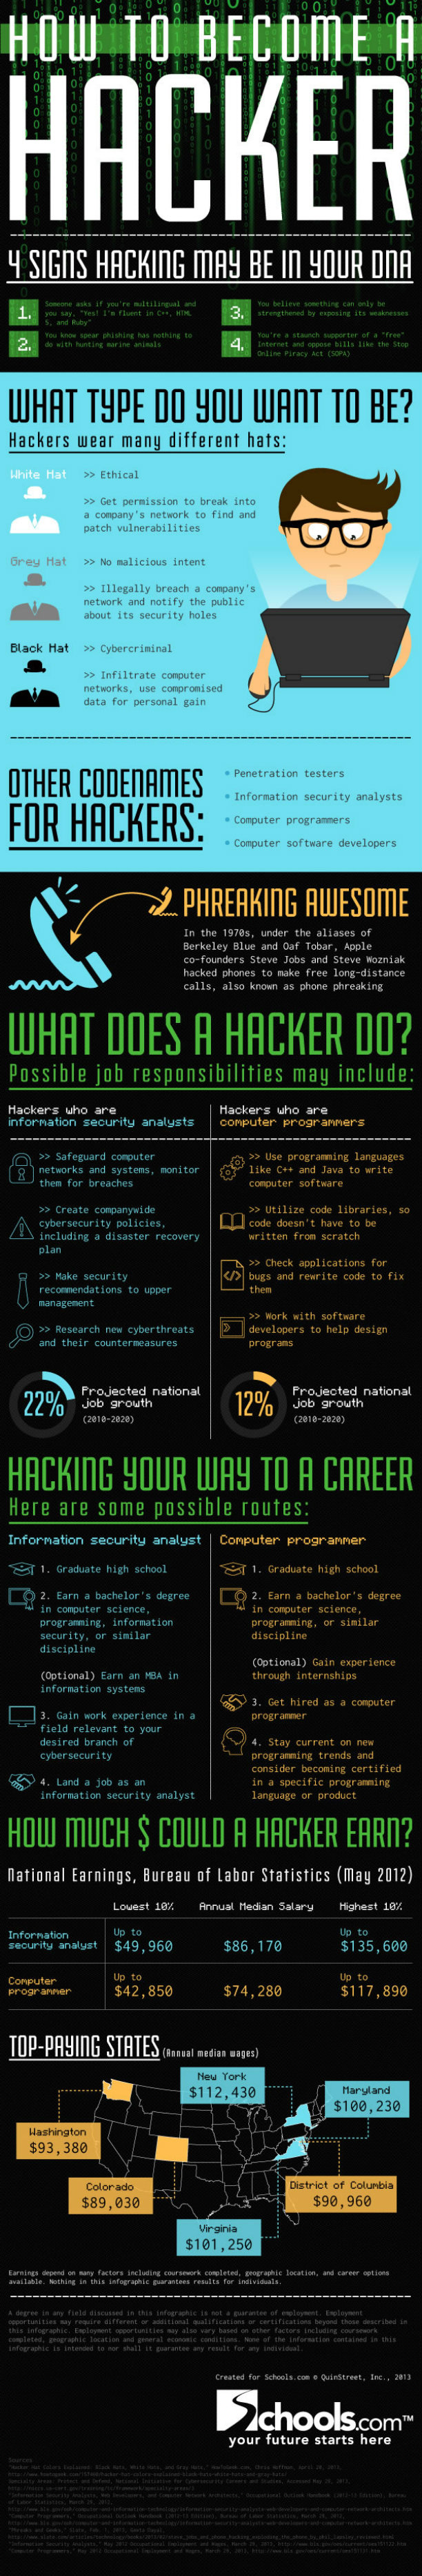 hacker infographic